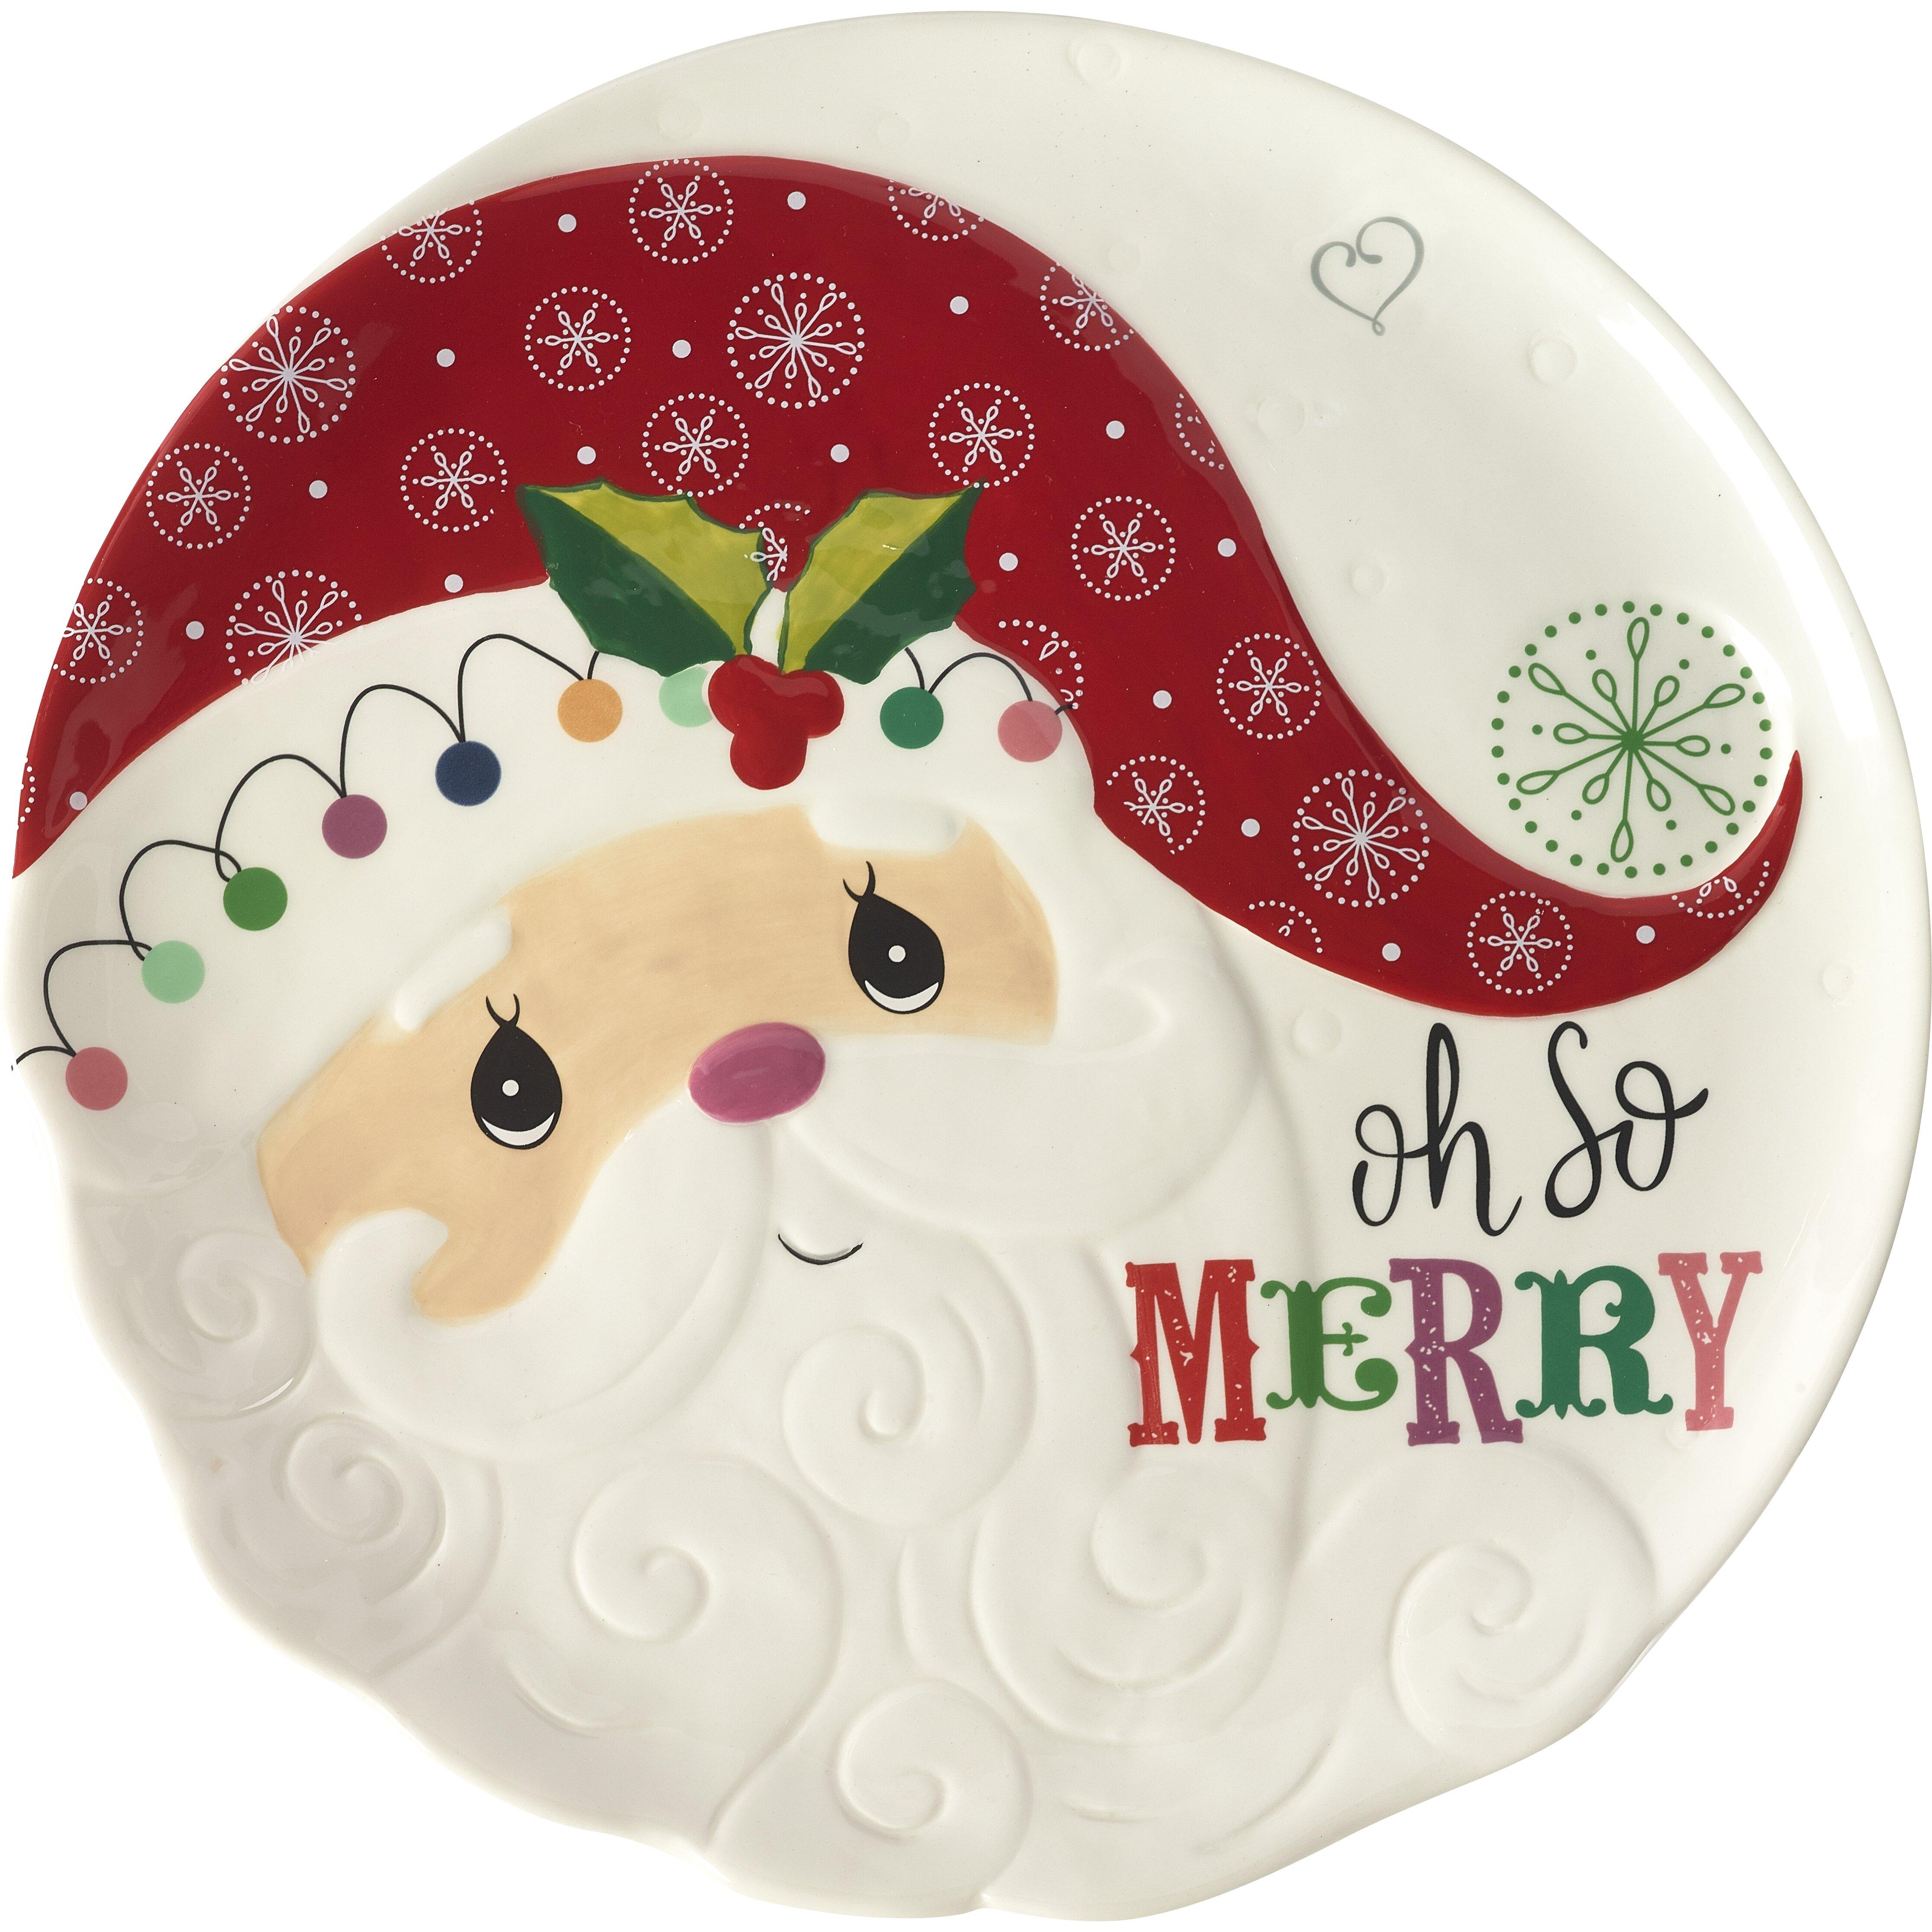 Precious Moments Oh So Merry Round Santa Serving Platter Wayfair